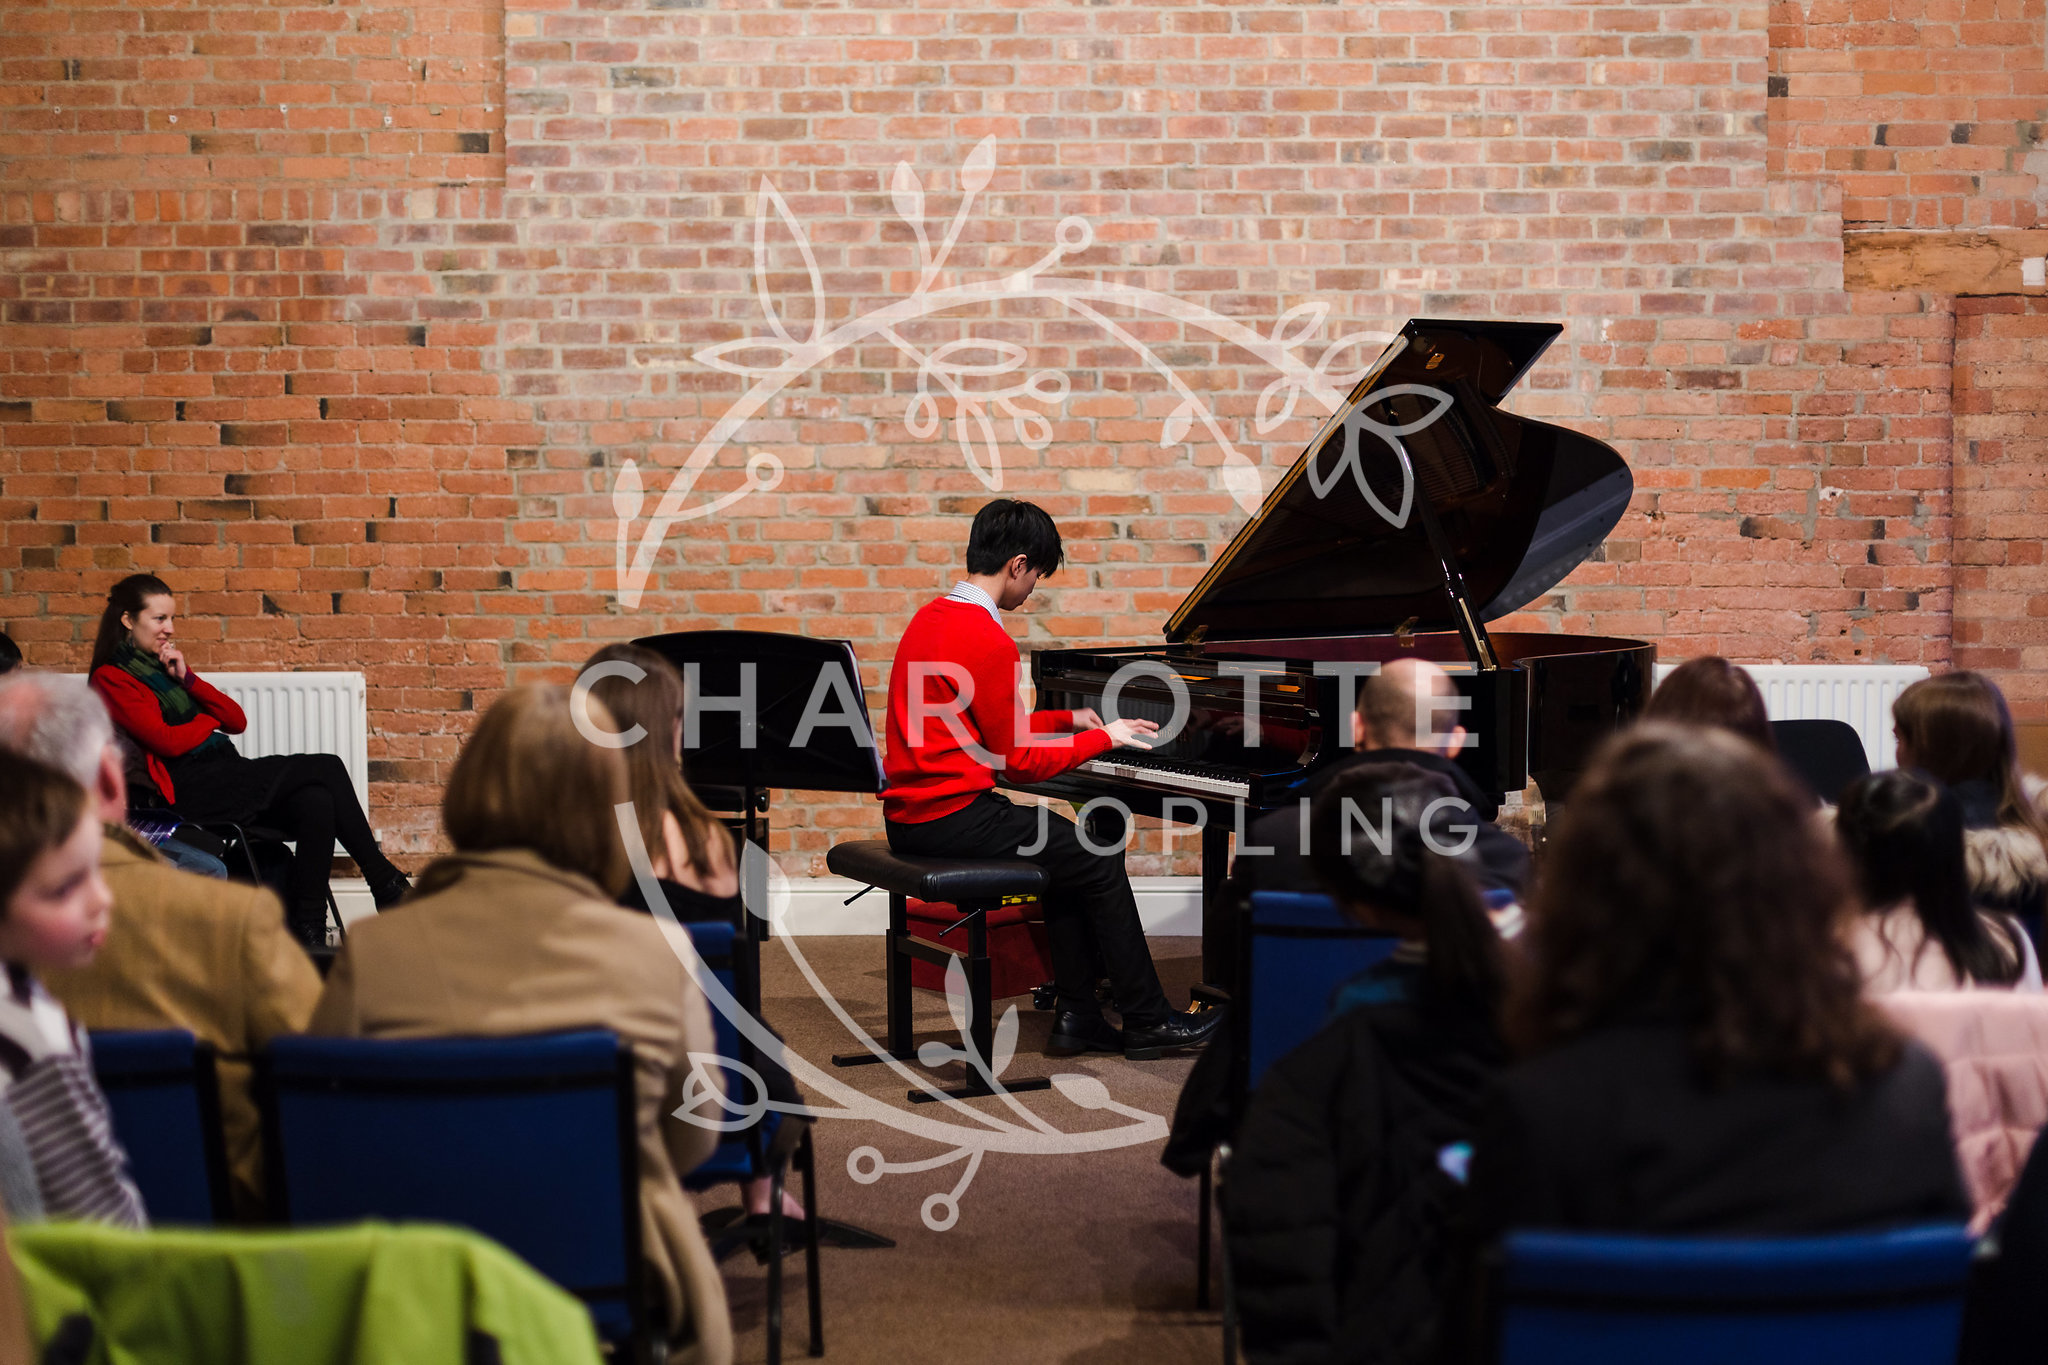 Stepping-Stones-Voicebox-Concert-2018-by-Charlotte-Jopling-38.jpg